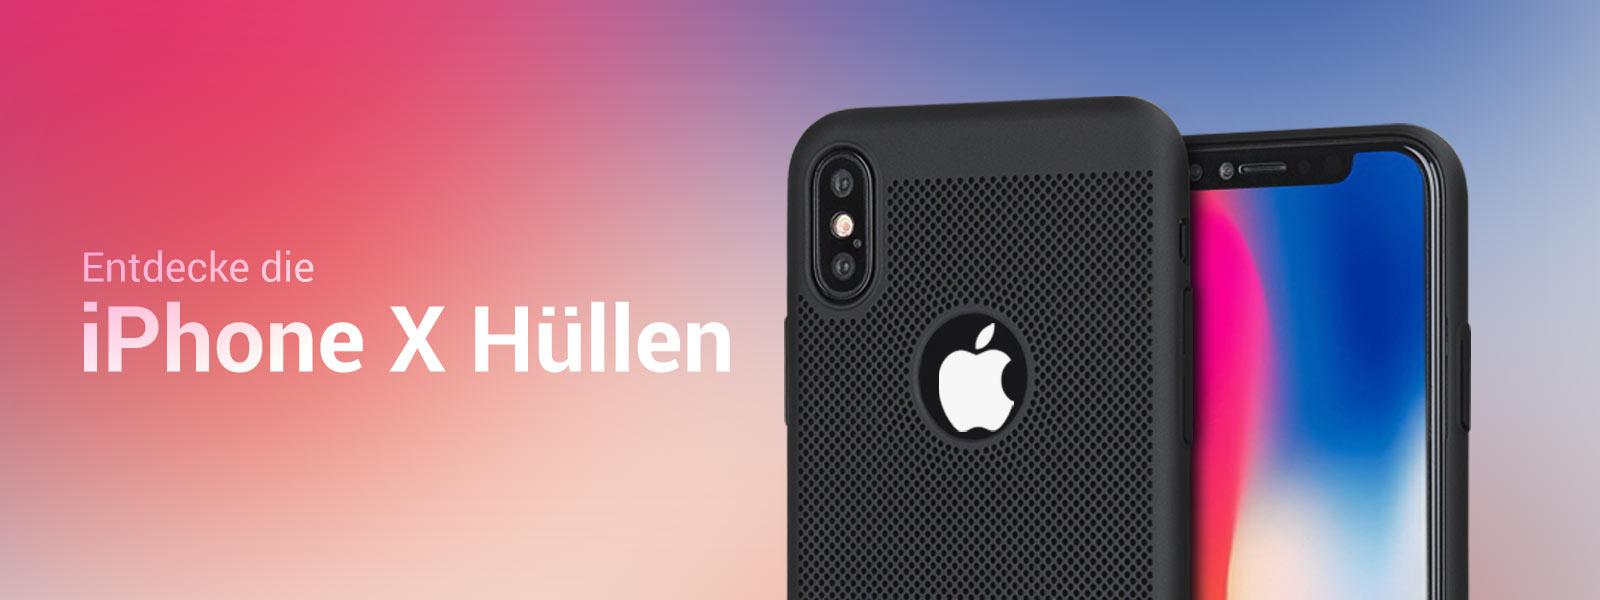 iPhone X Hüllen - Finde den besten iPhone X Hüllen